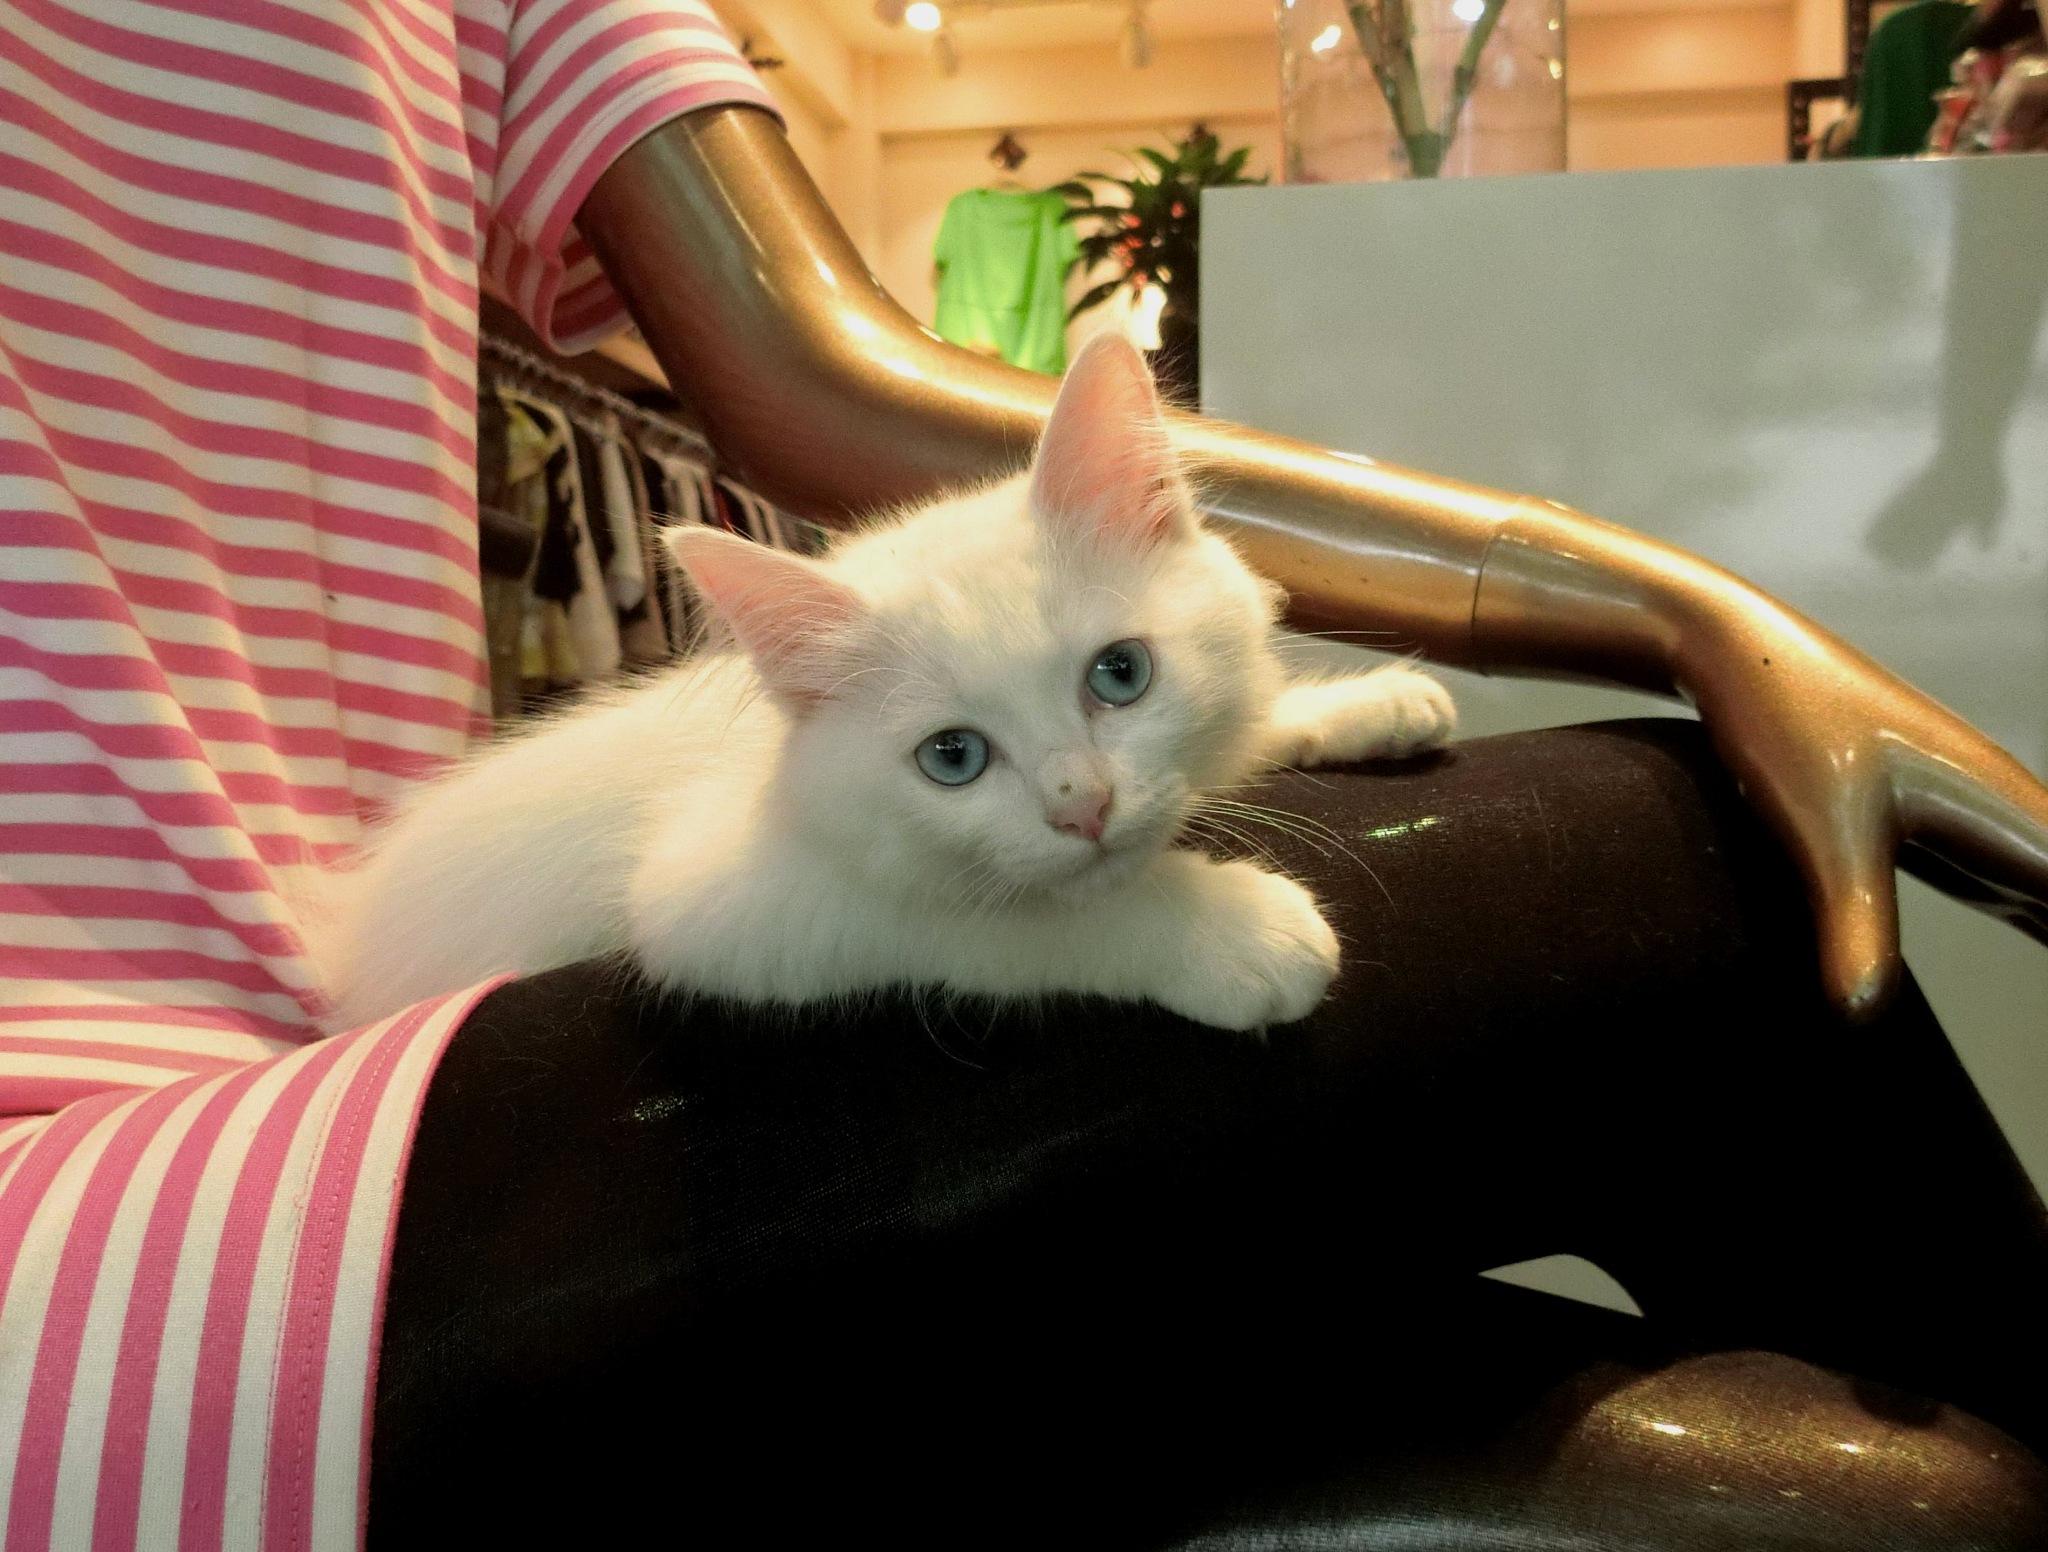 Shanghai cat by pop88123